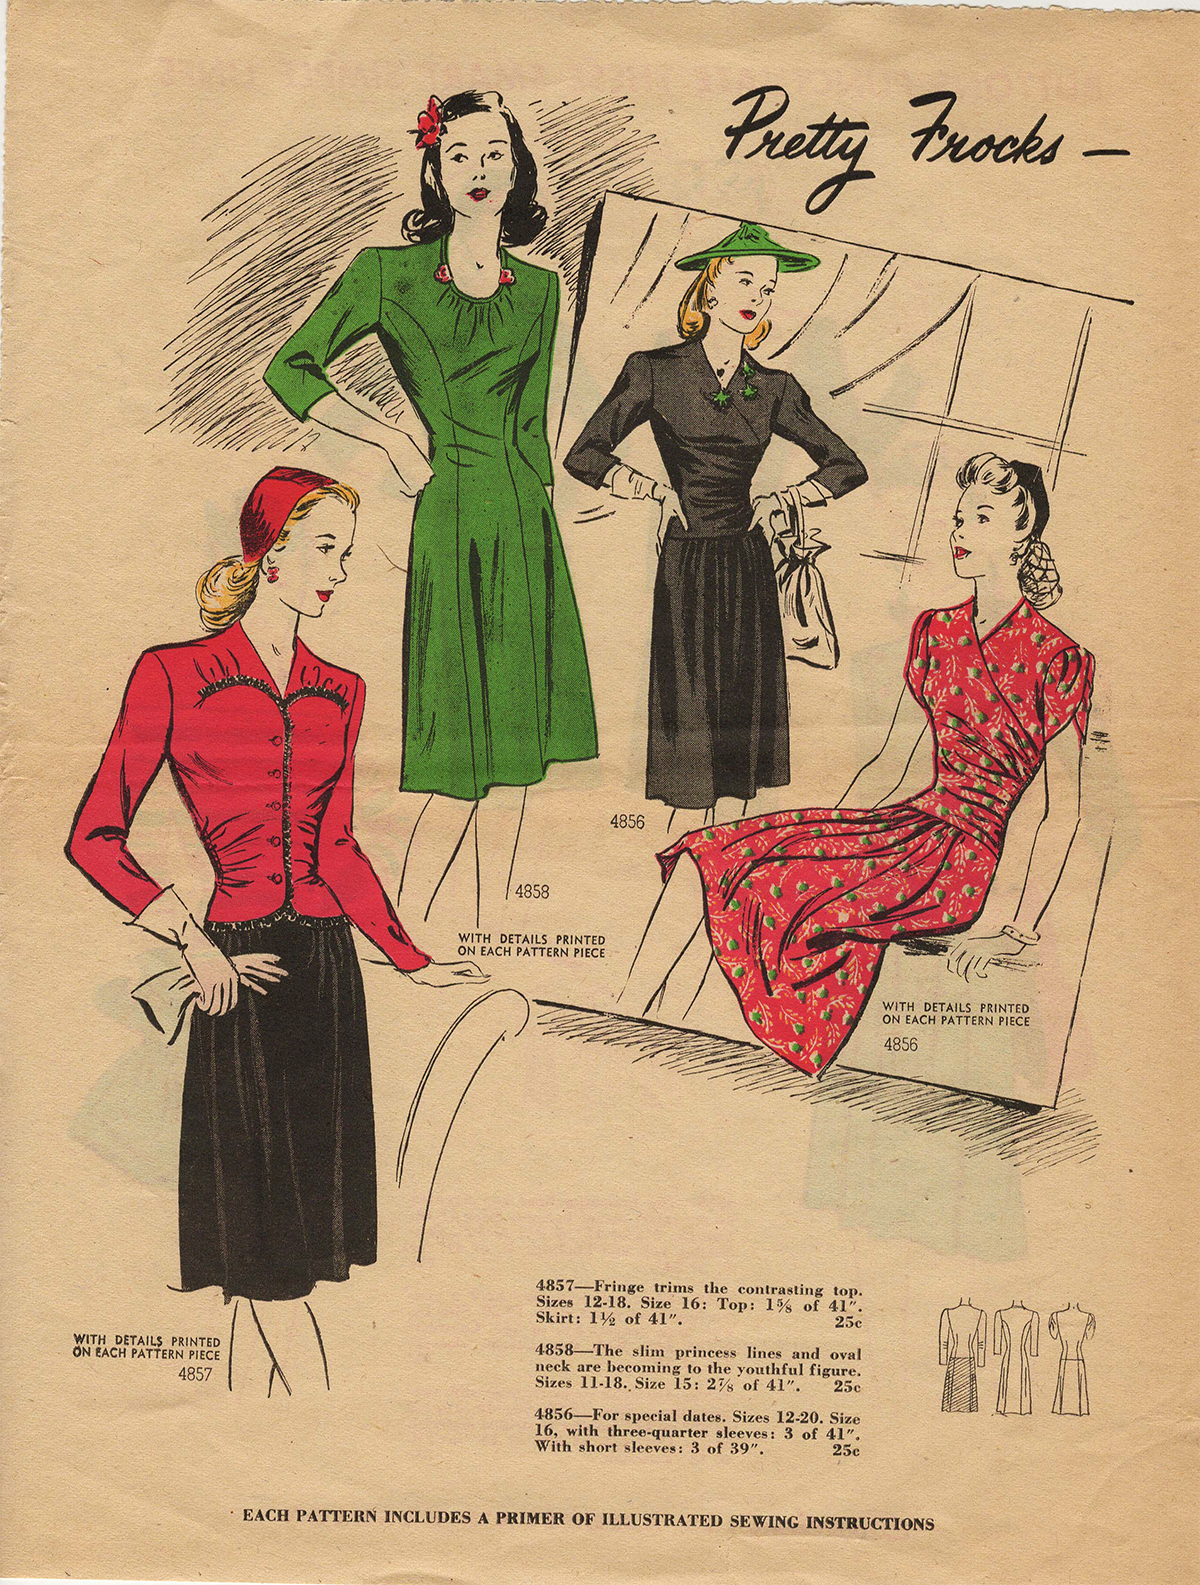 The Closet Historian: Prevue Simplicity January 1944